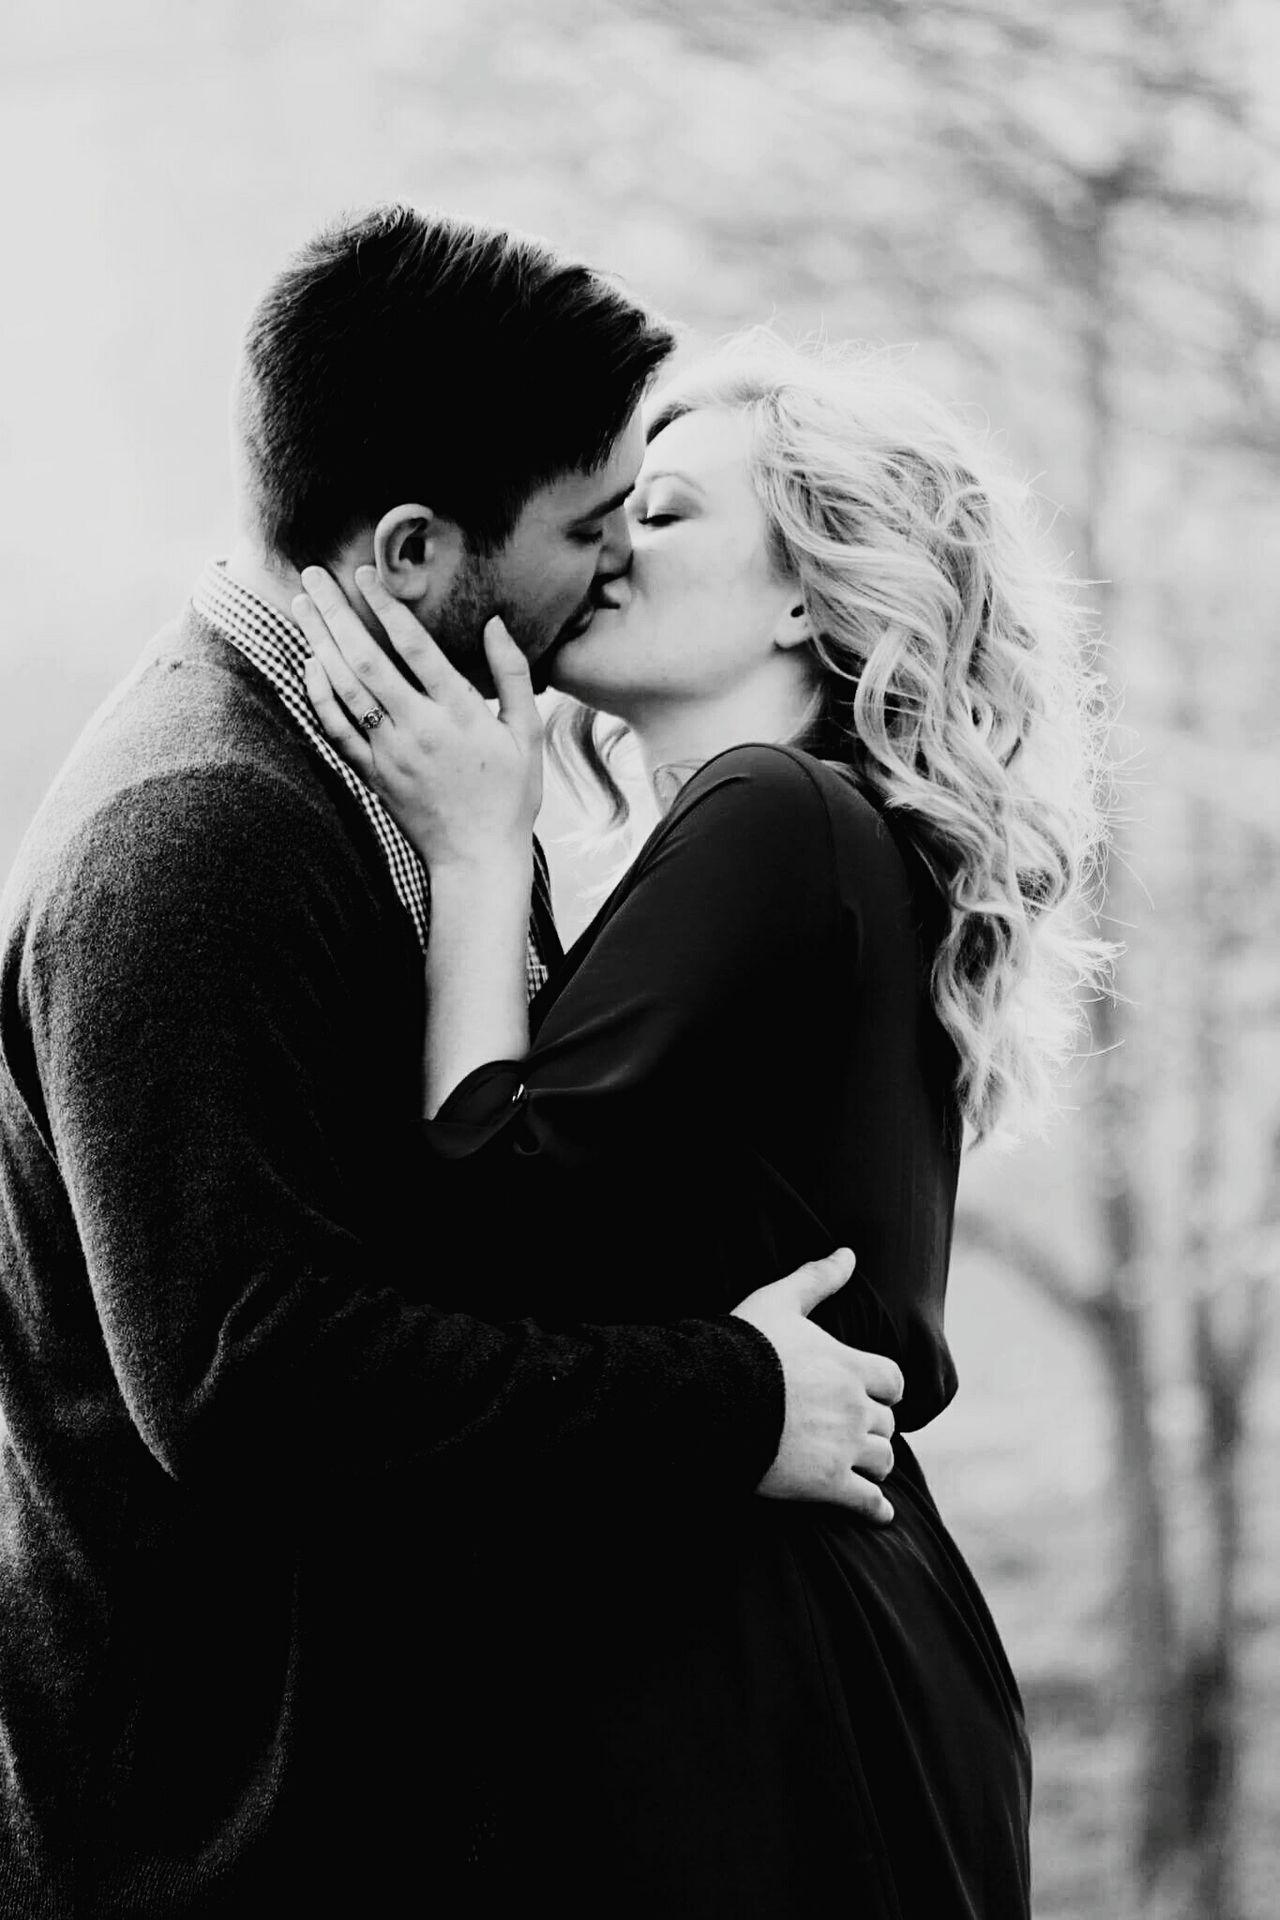 Couples Photographer Couples Photography Love Romance Black & White Atlanta, Georgia Piedmont Park Atlanta Photographer Canon Canon Photography Canon Rebelt3i